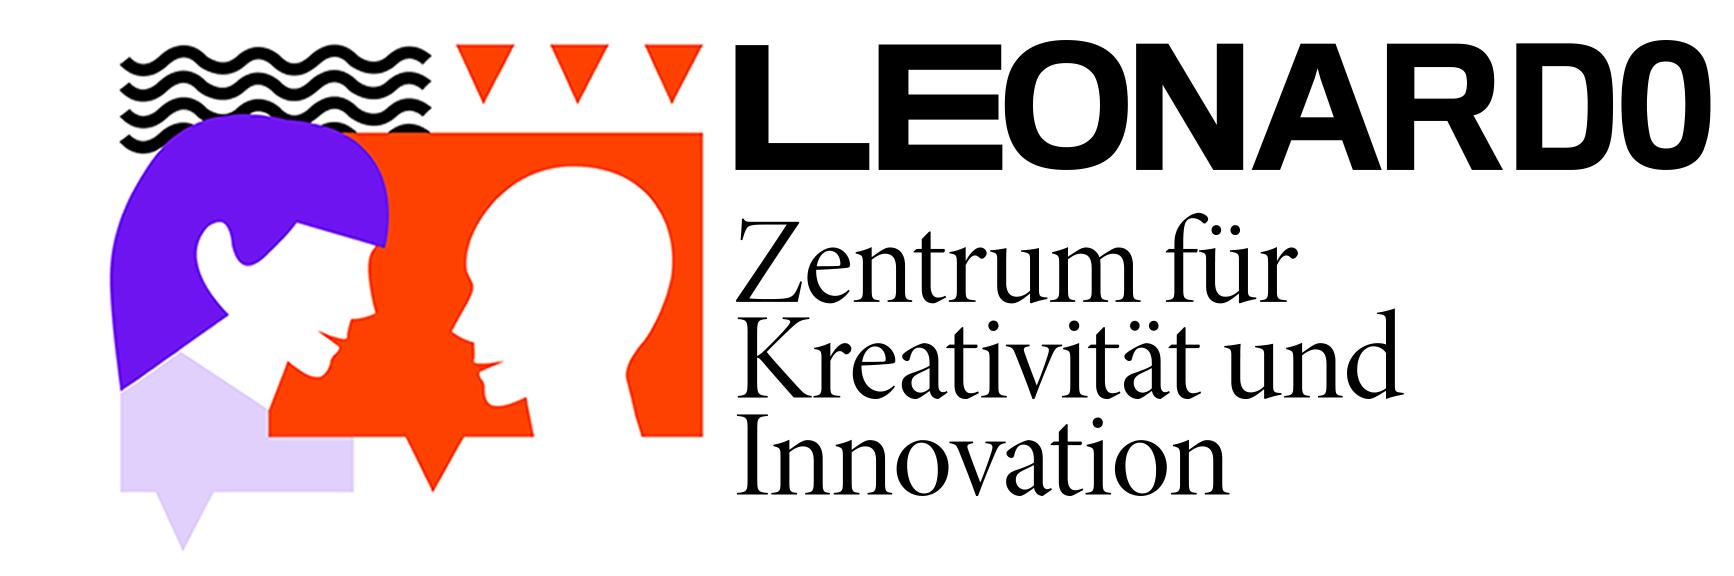 Forum Logo und LEONARDO Logo